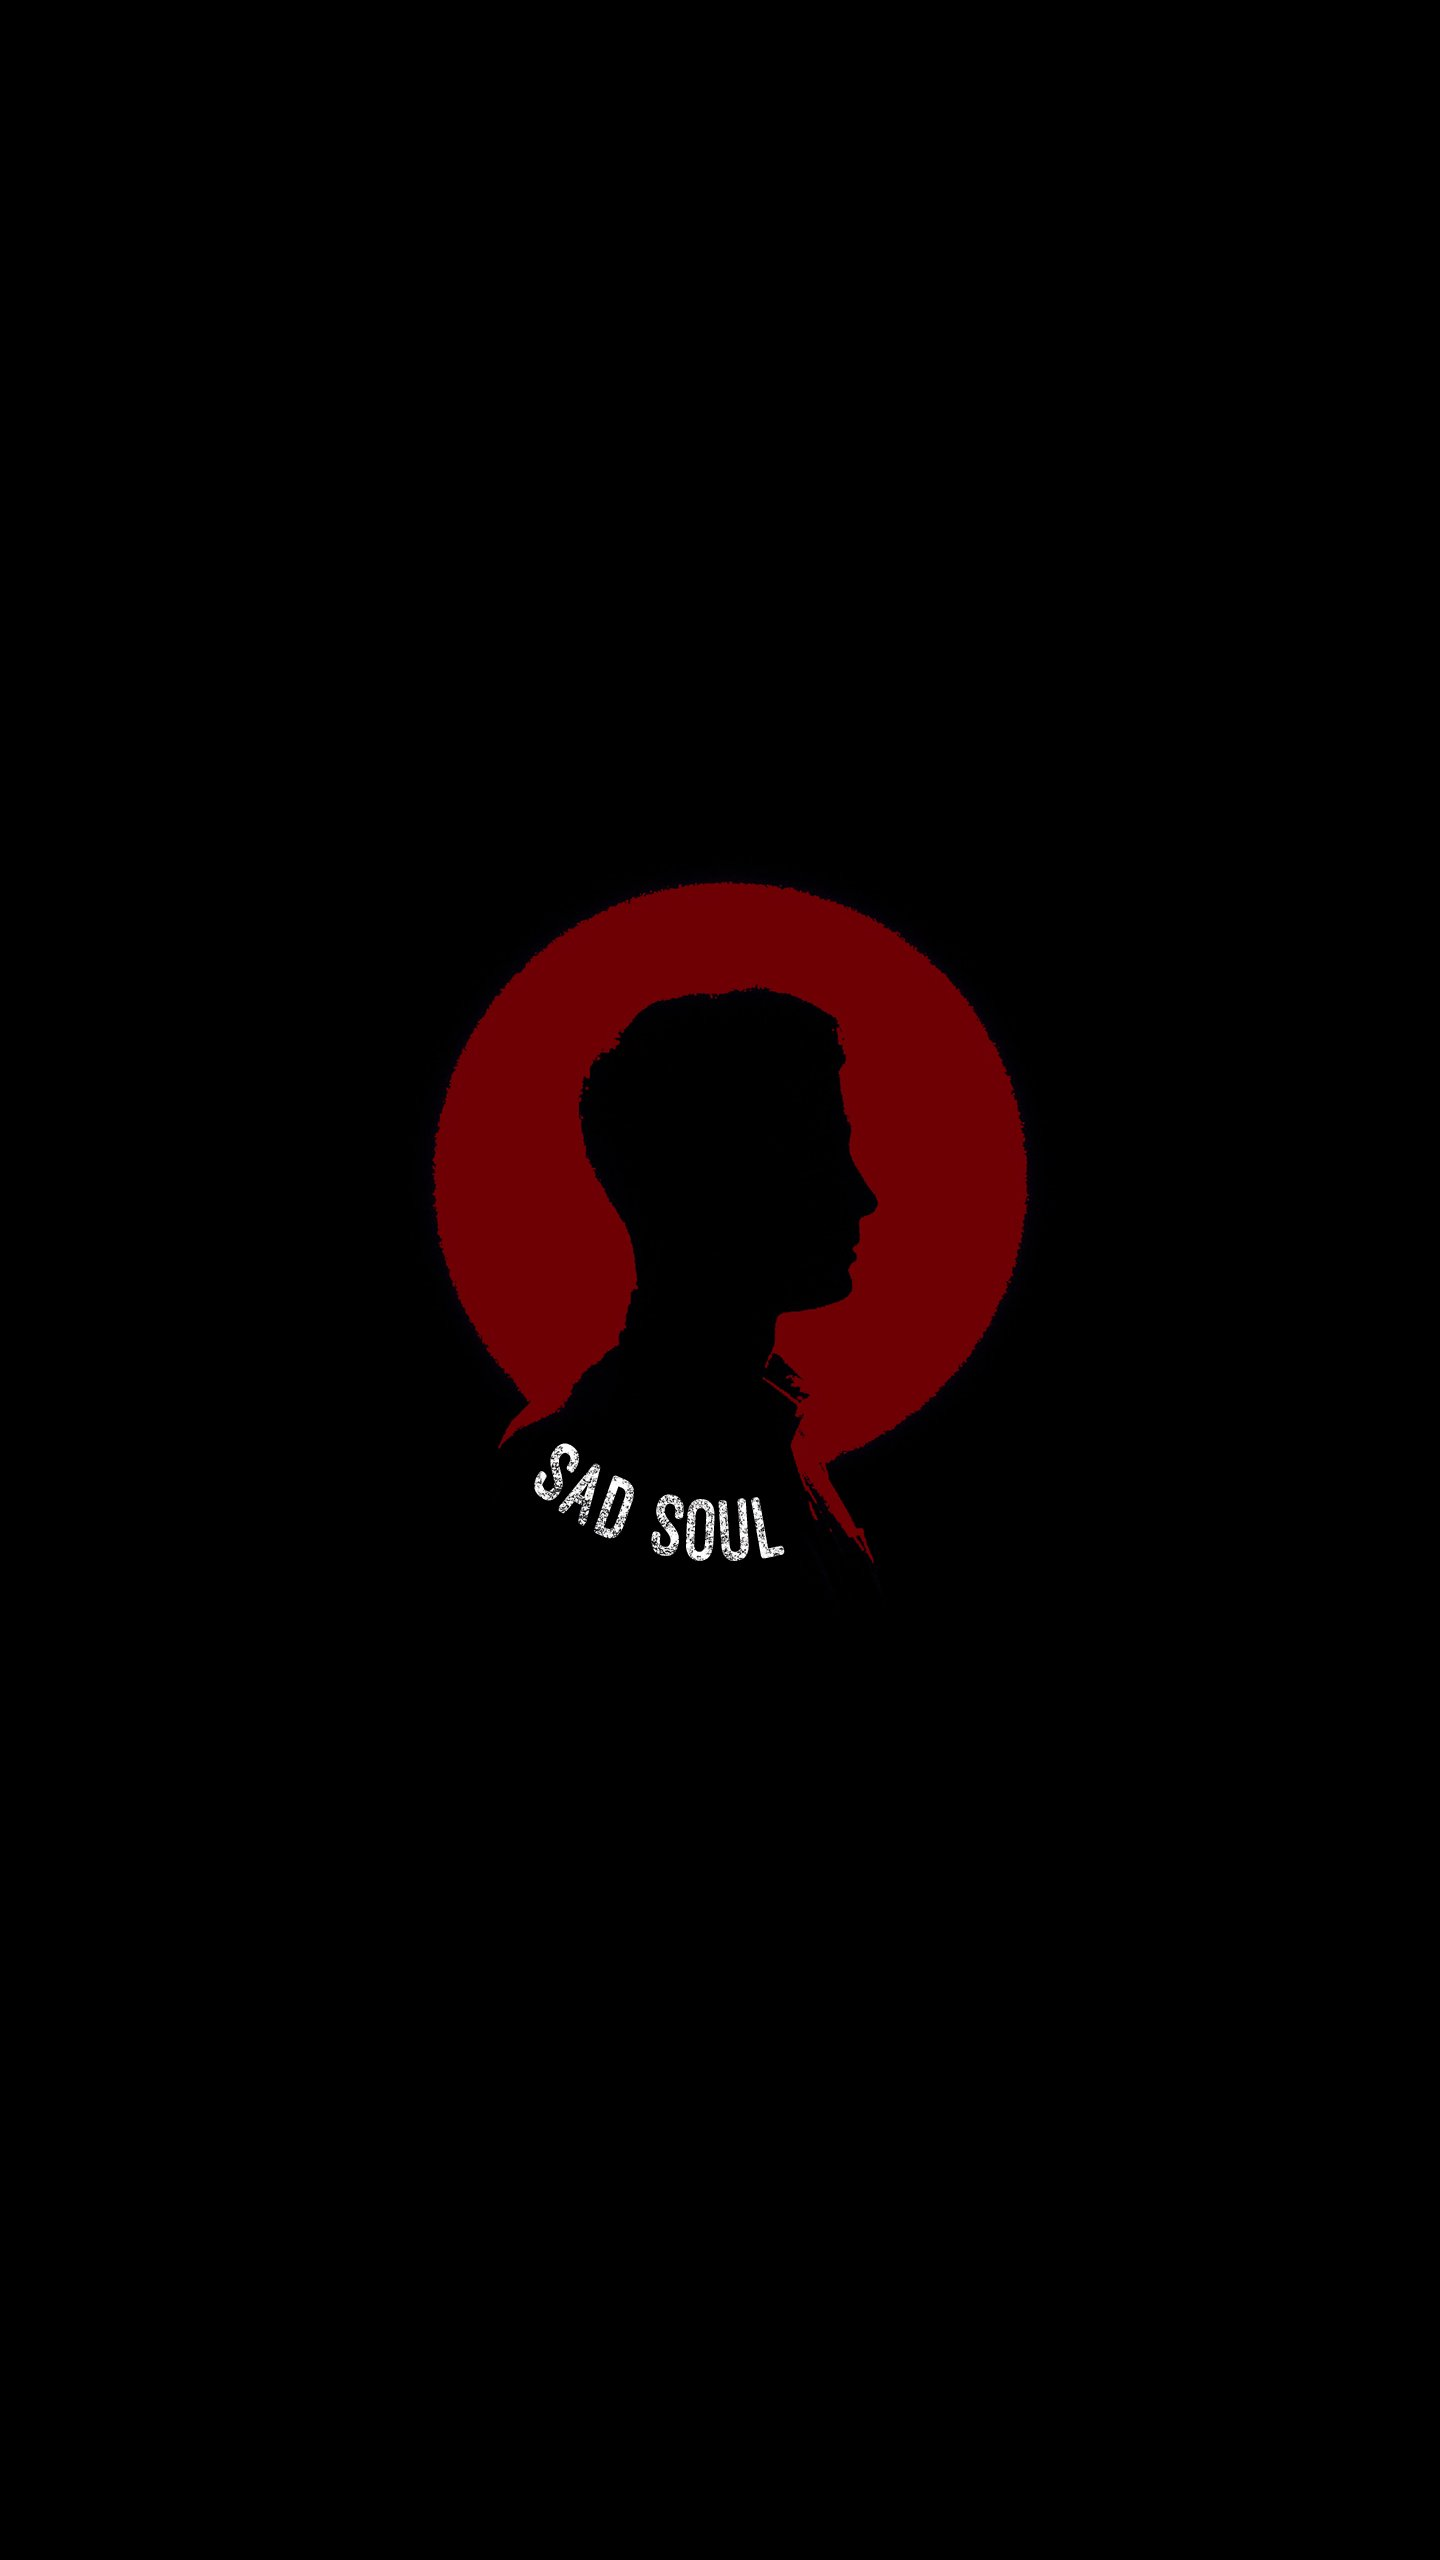 Sad Soul iPhone Wallpaper